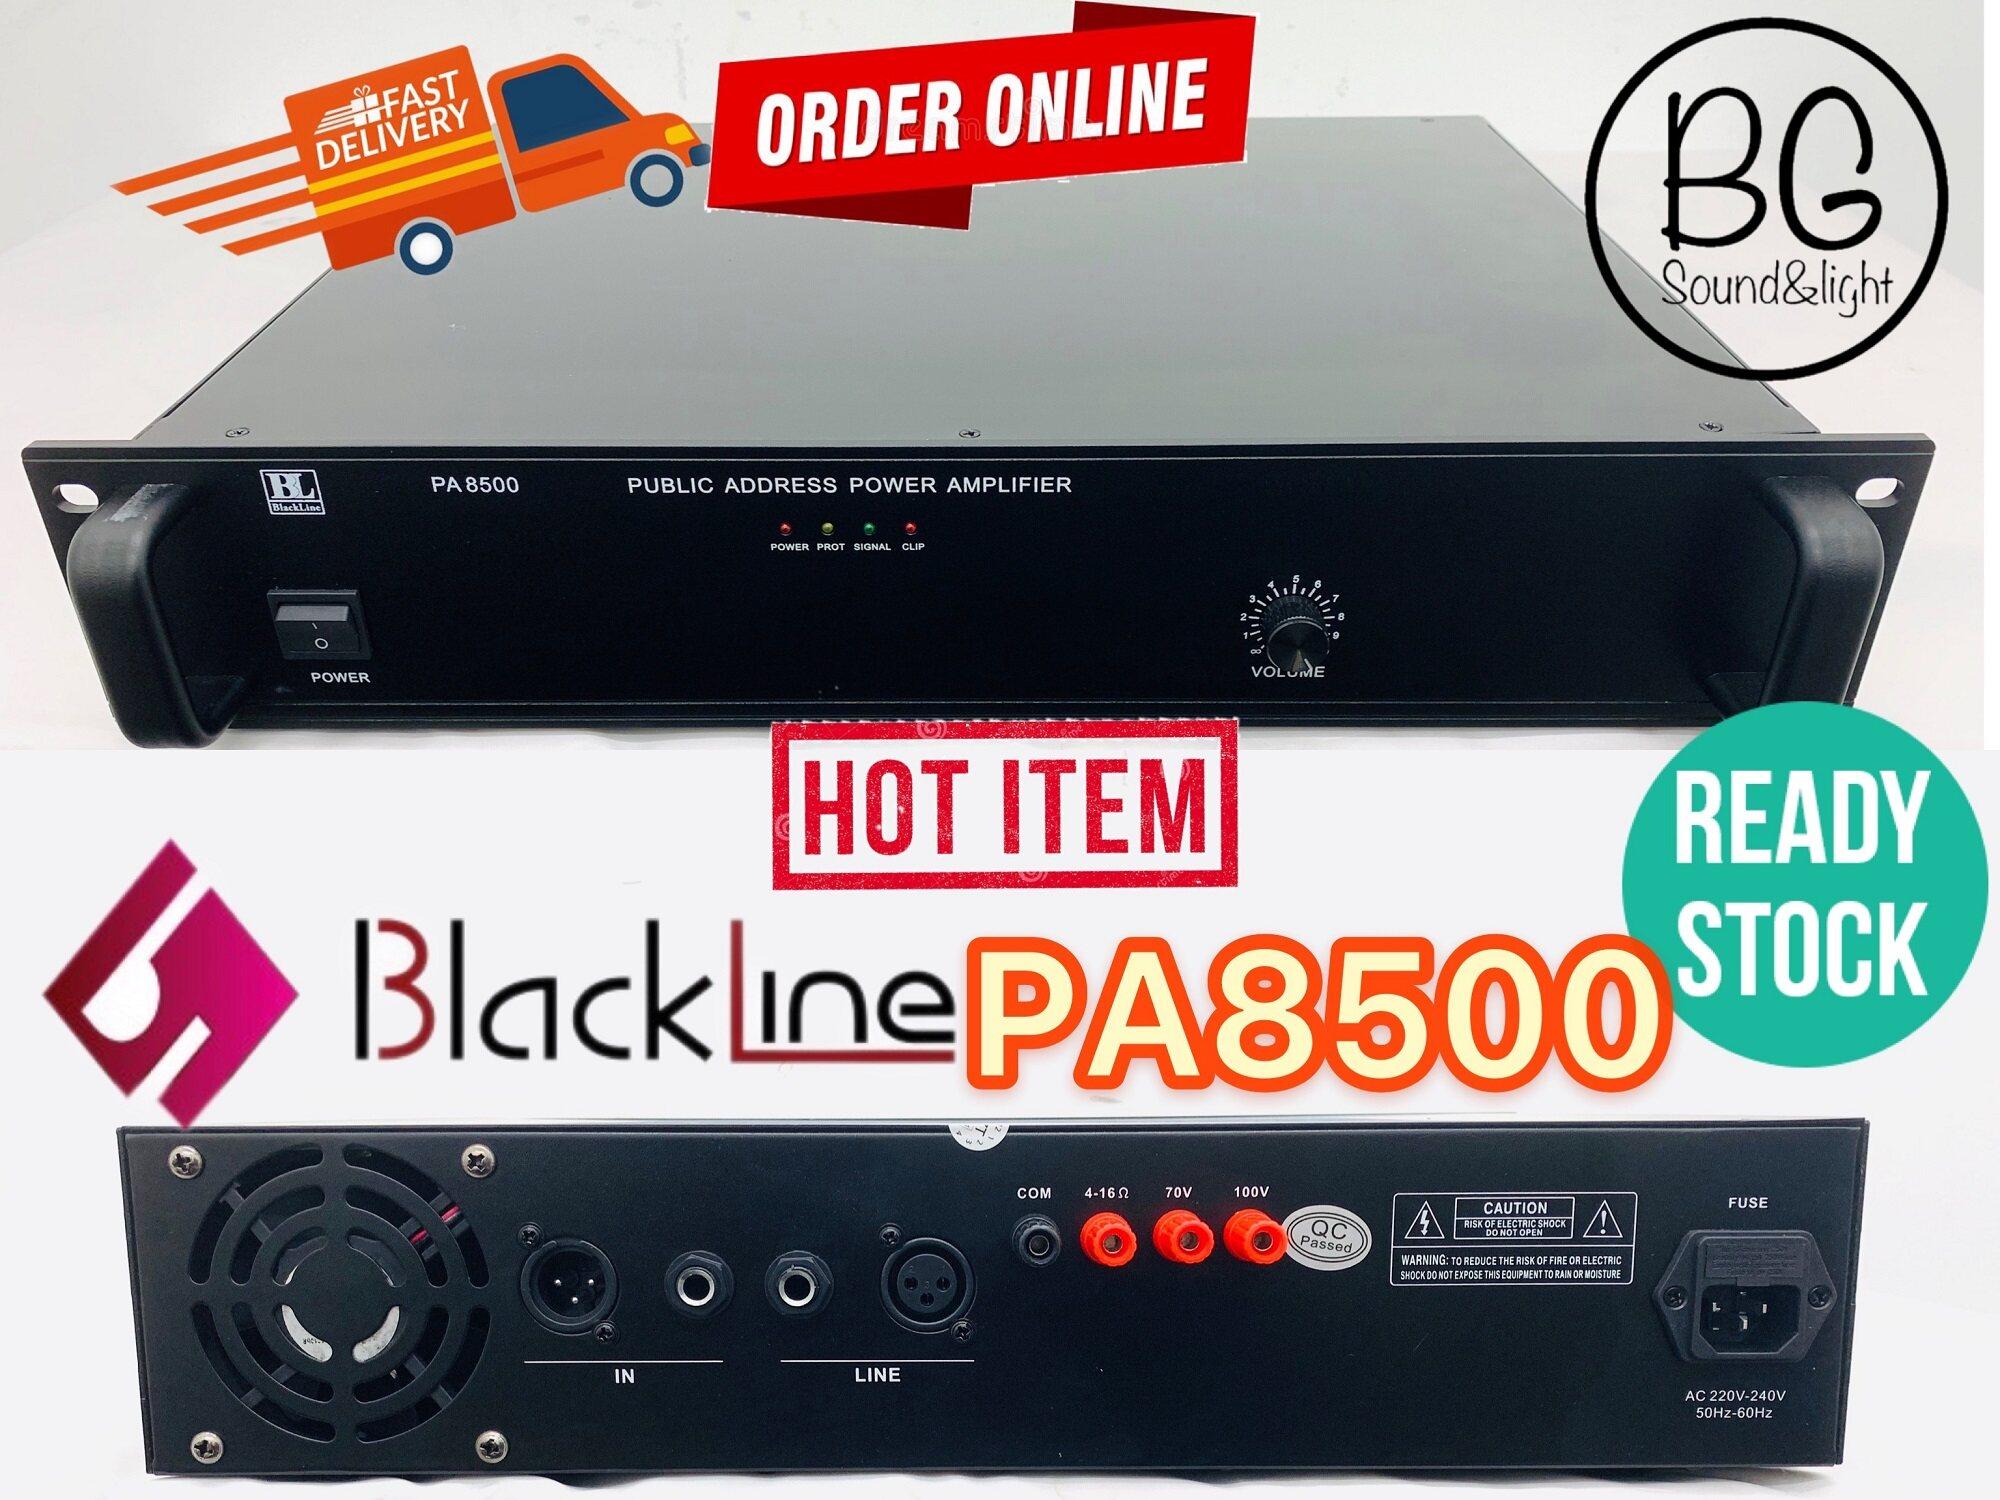 [Ready Stock]Blackline PA8500 500W Public Address PA System Power Amplifier